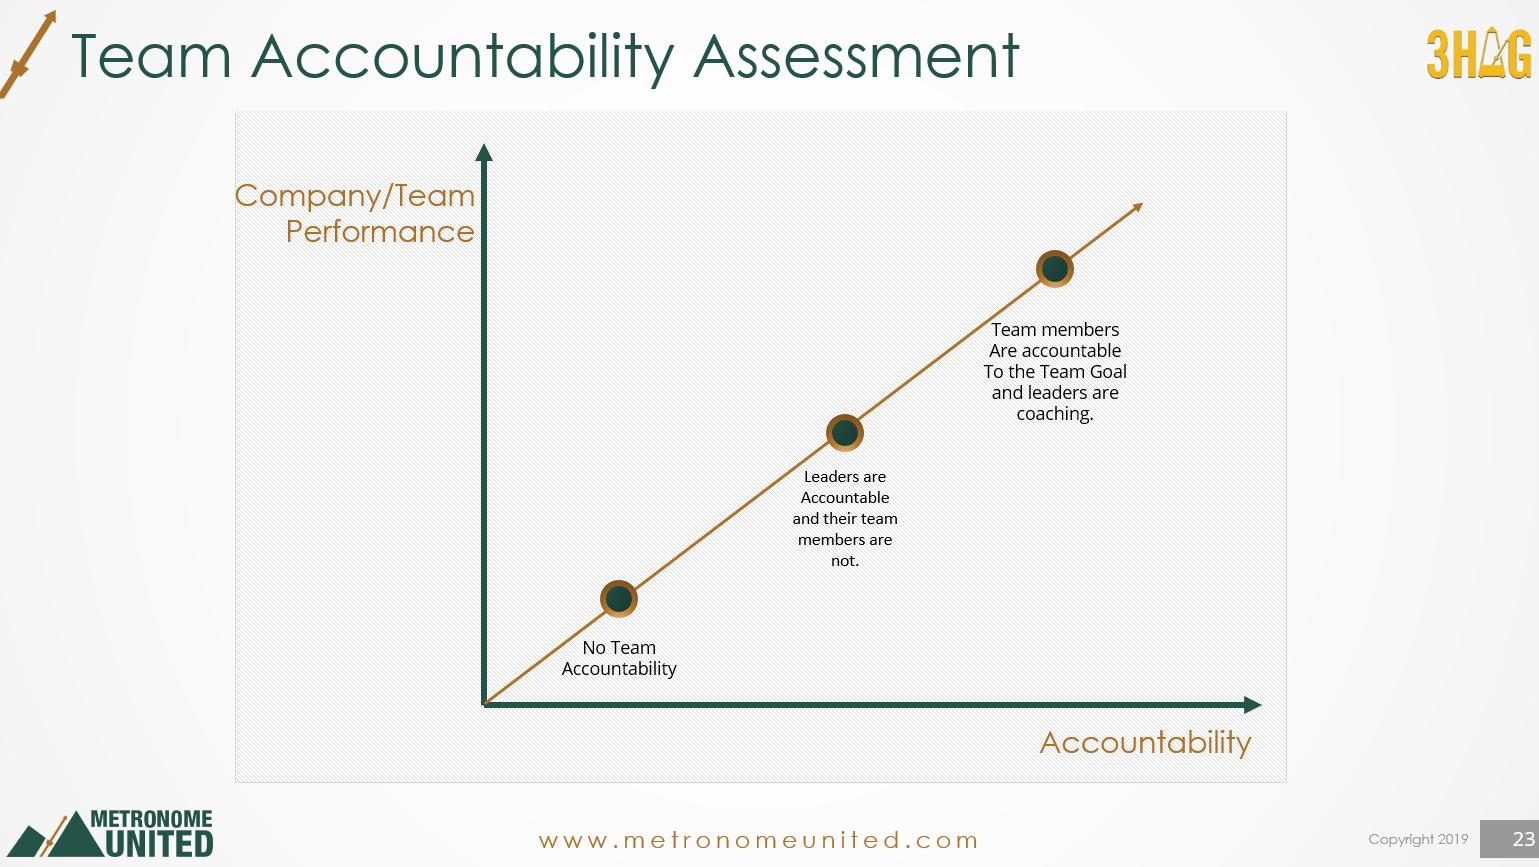 Team Accountability Performance - Accountability